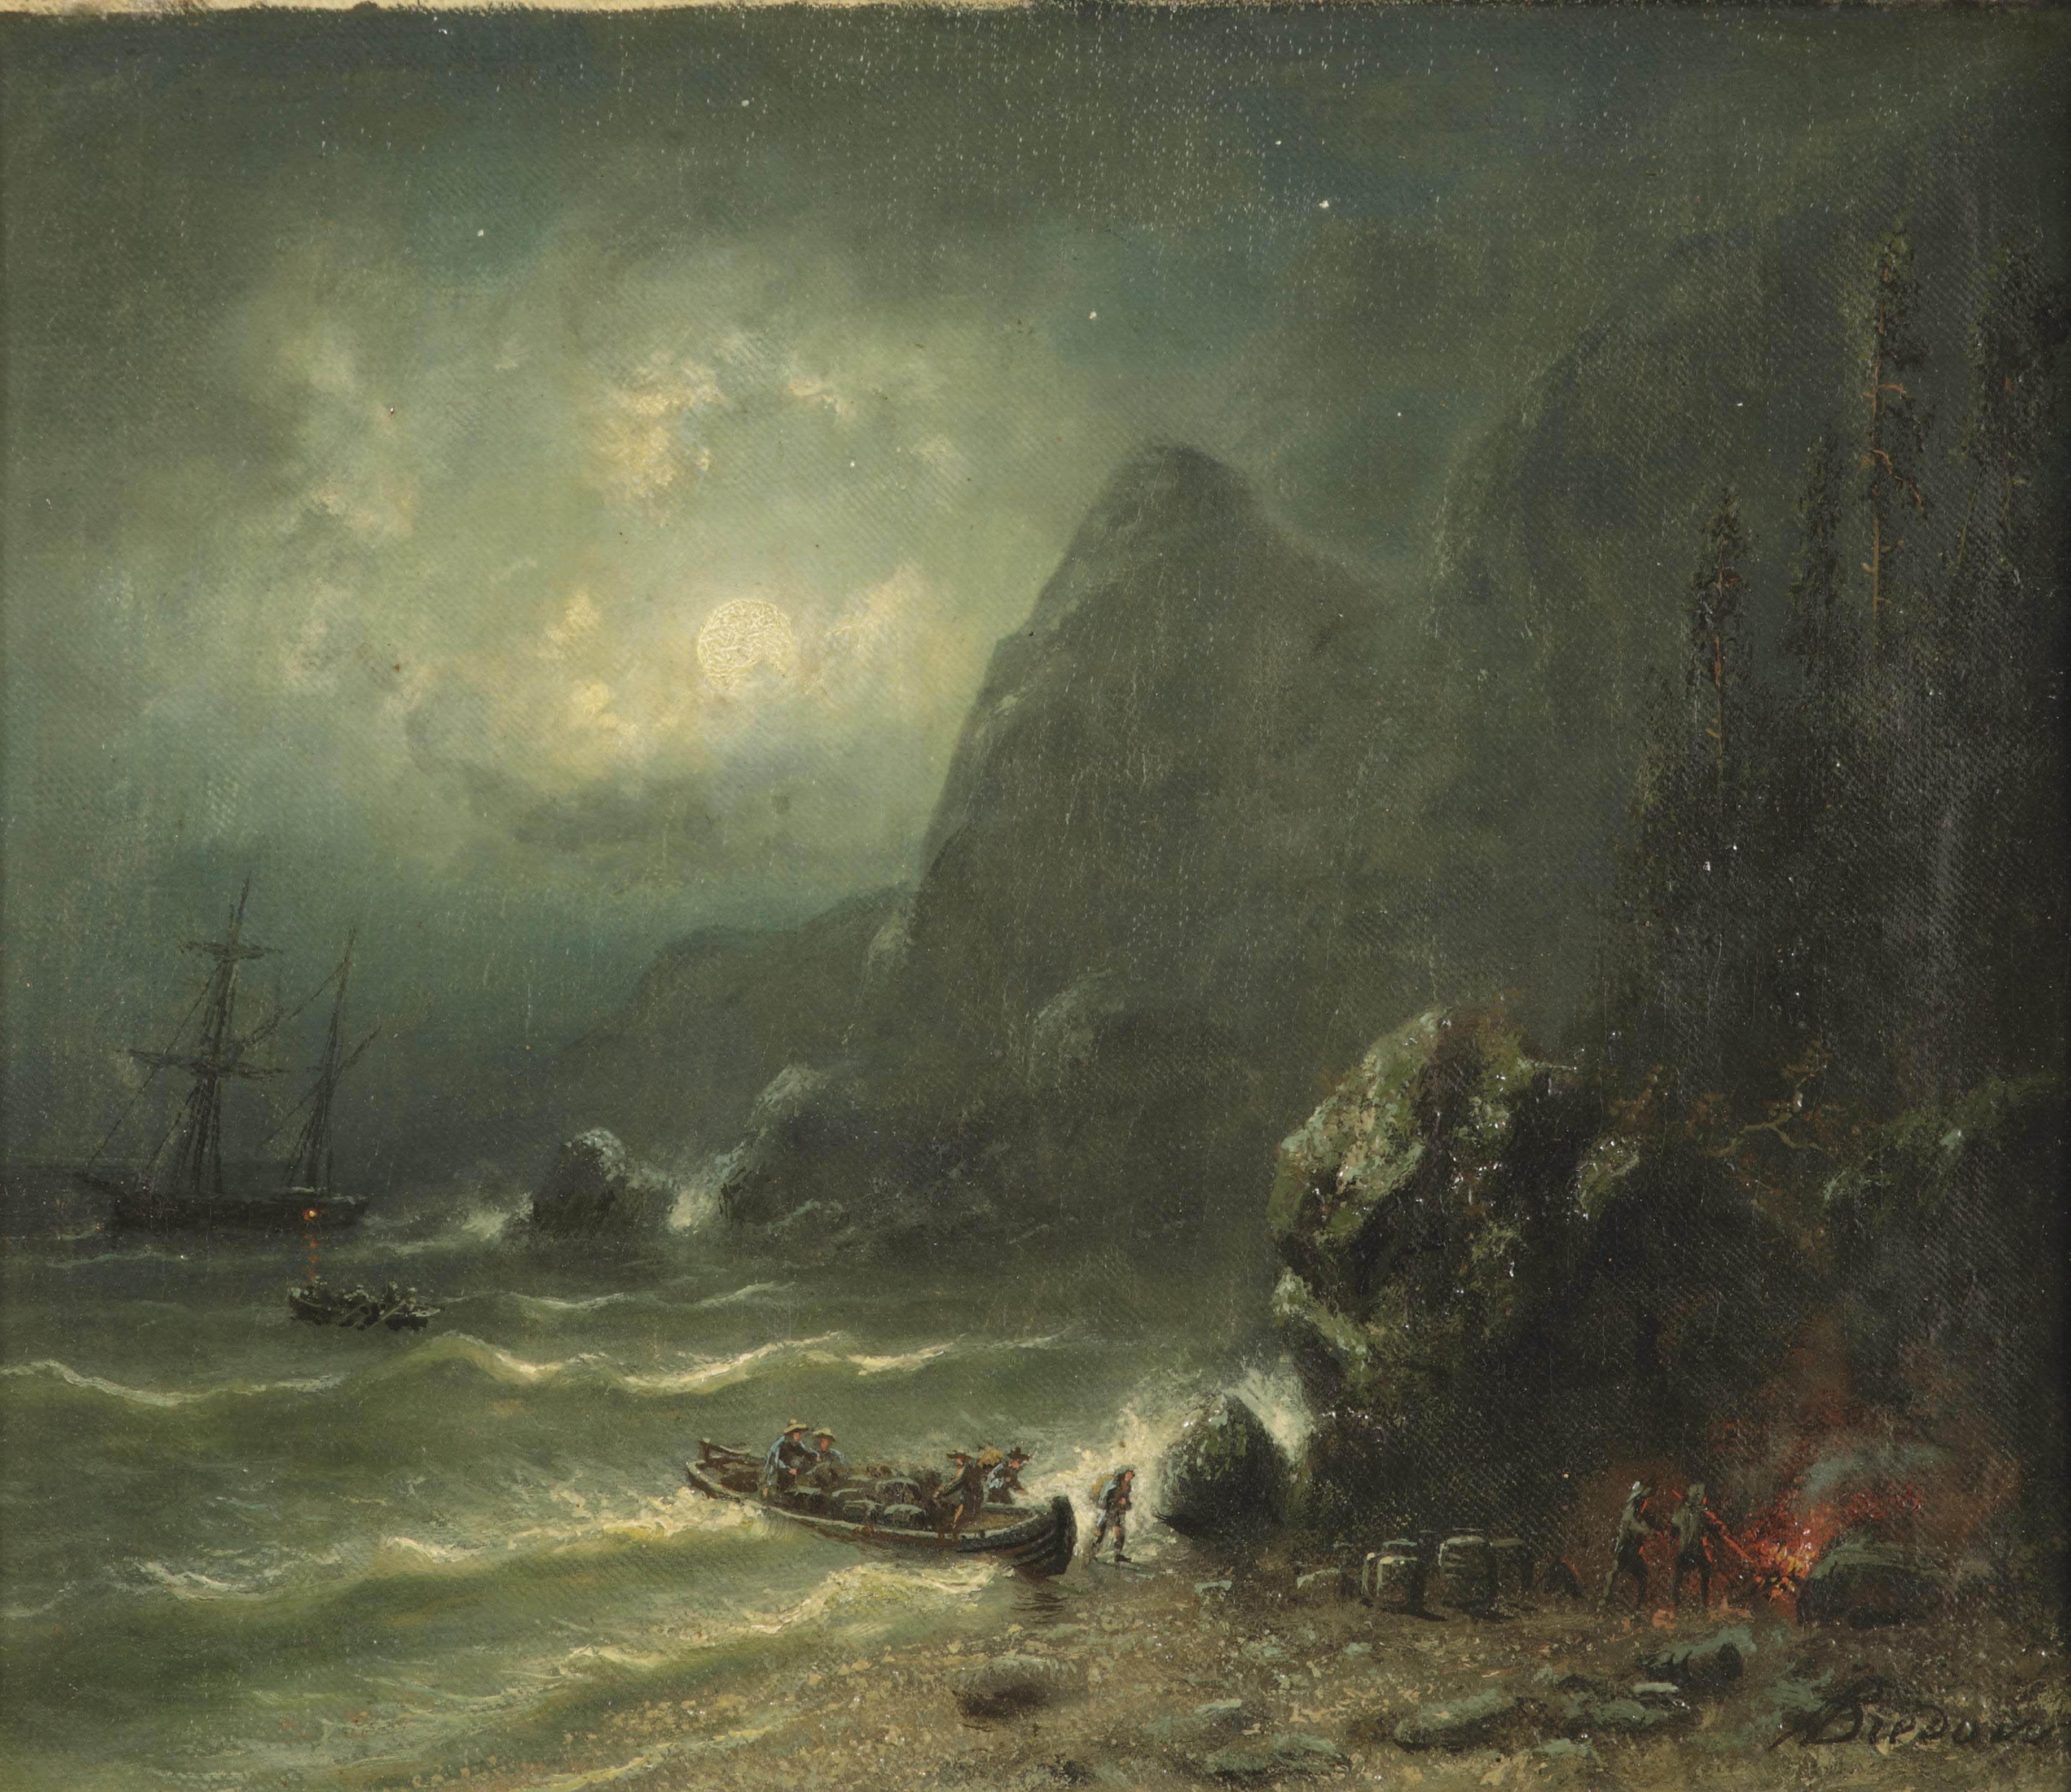 Unloading a ship on a seashore by moonlight